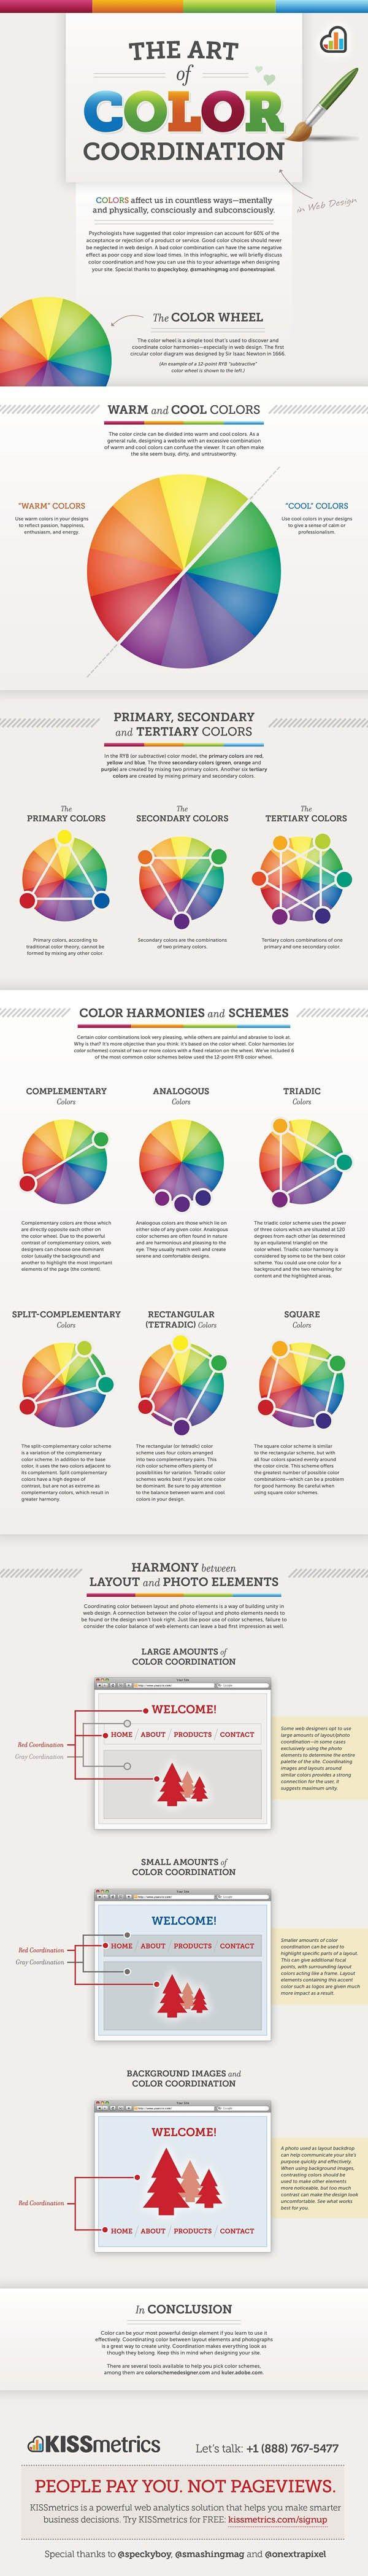 The Art of Color Coordination in Web Design [Infographic] - Smashfreakz